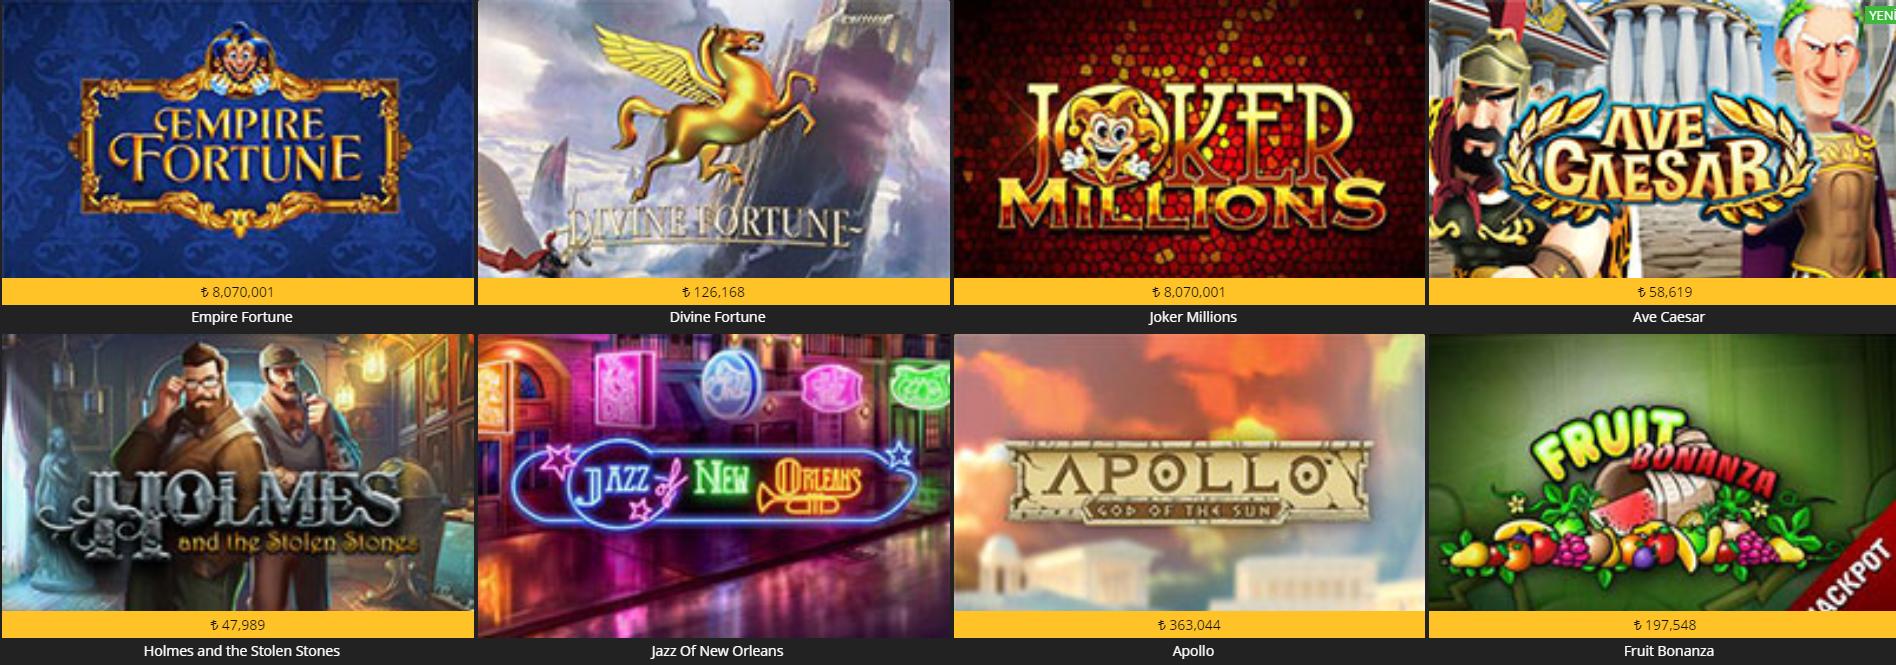 MobilBahis Sitesinde Jackpot Fırsatı